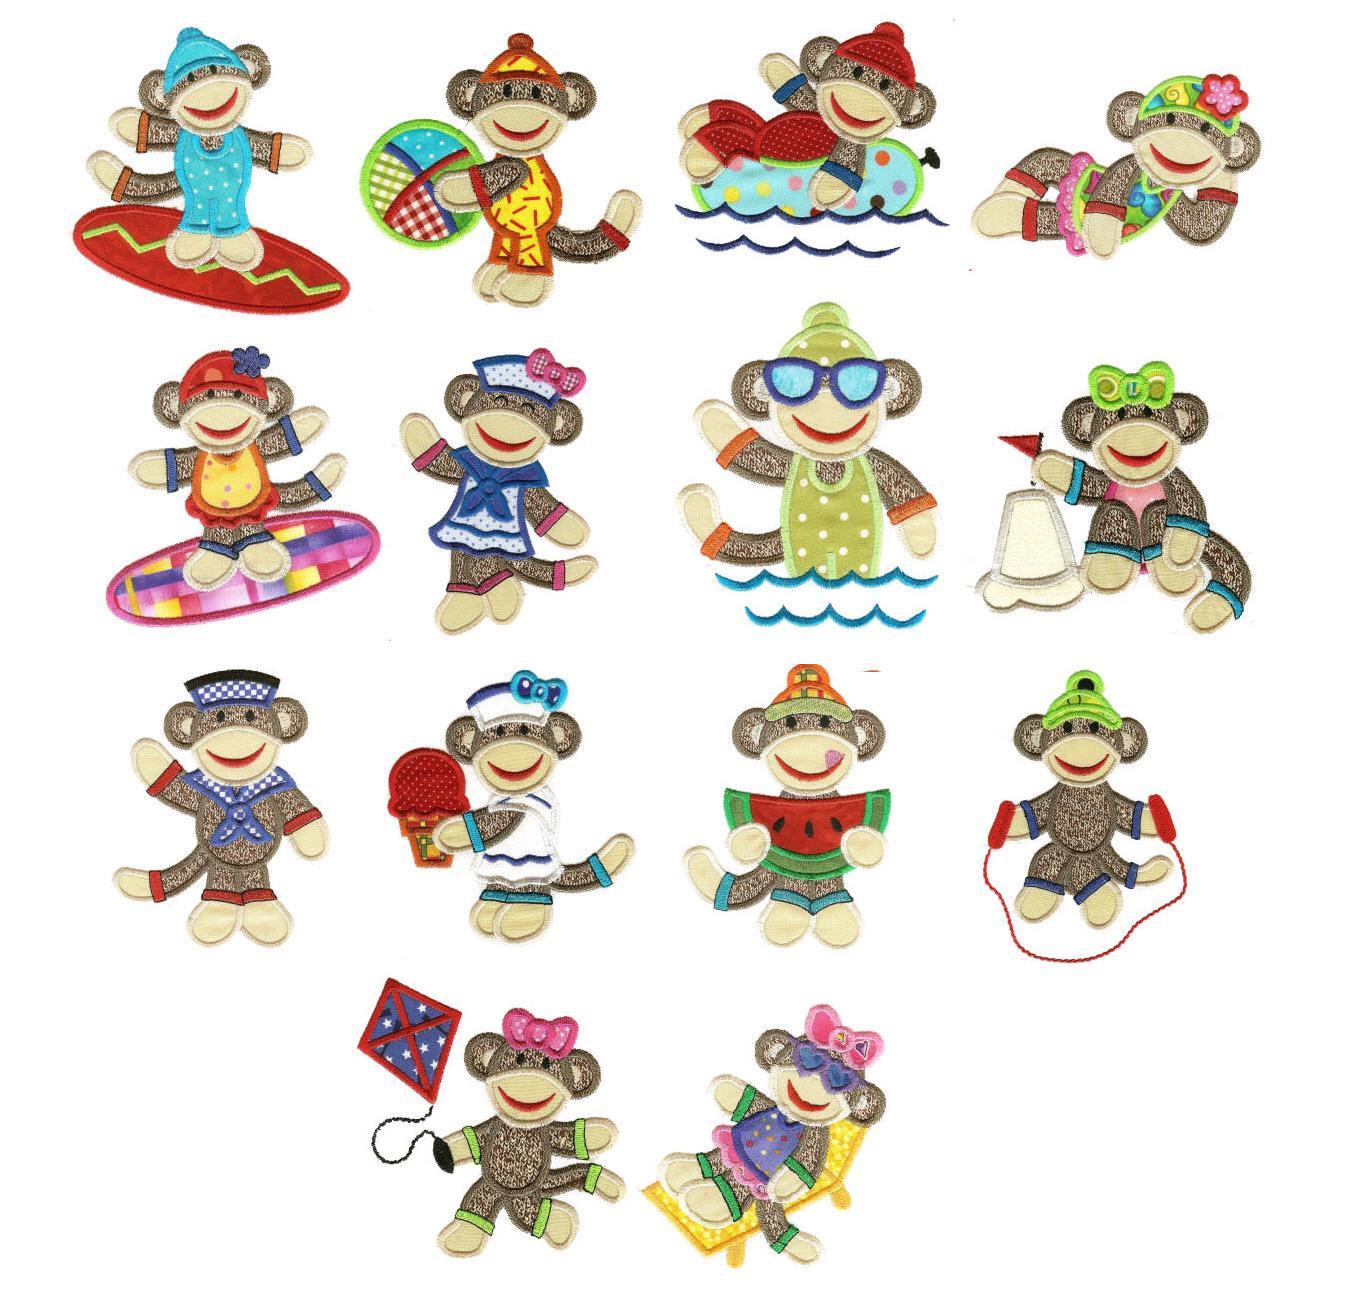 summer_sock_monkeys_applique_embroidery_designs